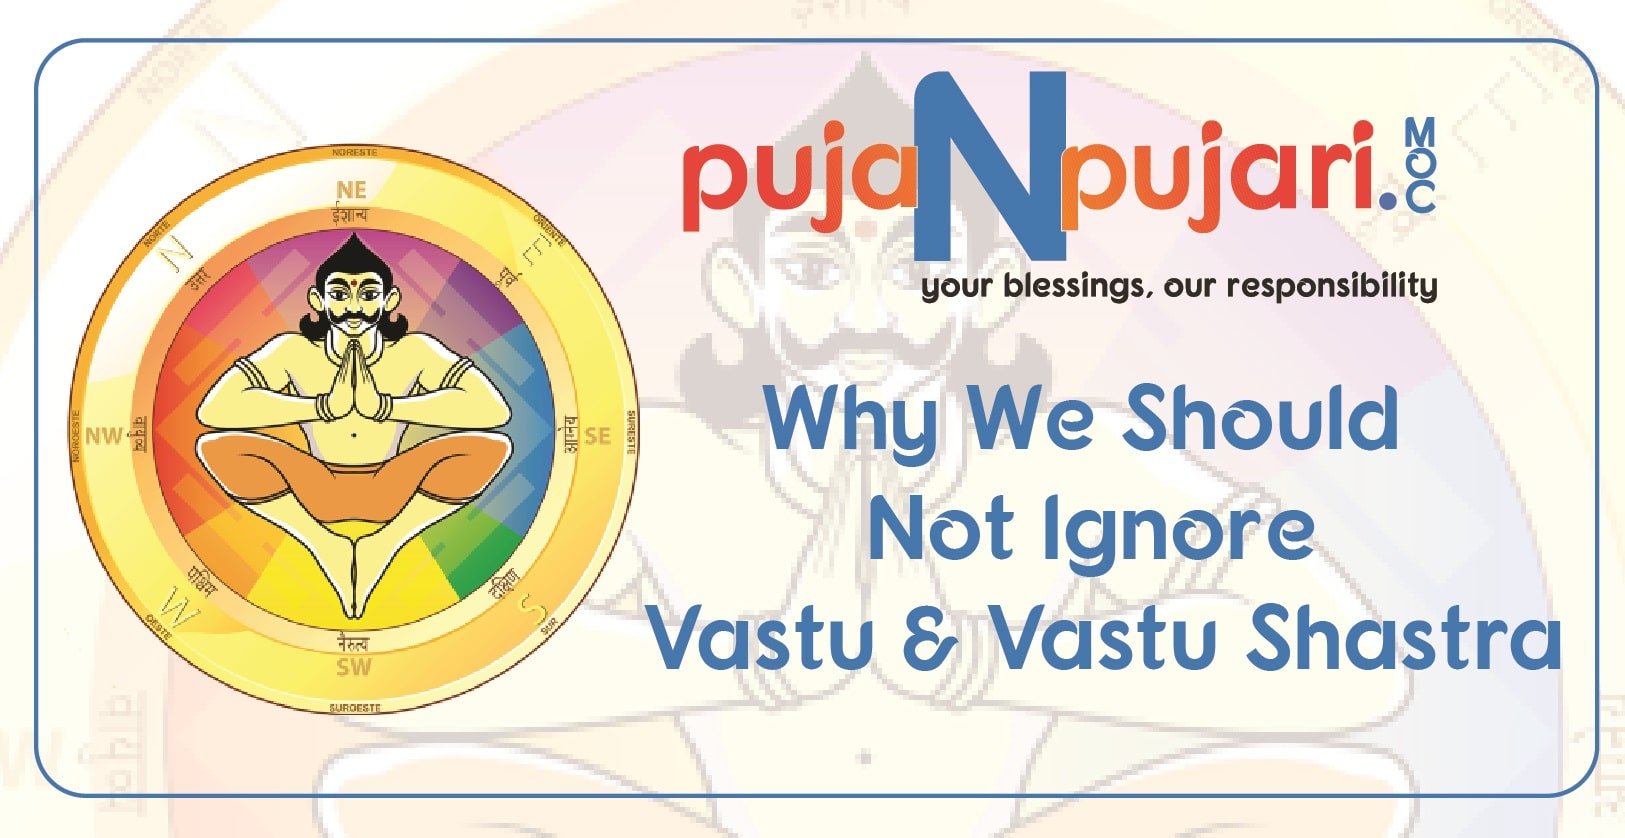 Why We Should Not Ignore Vastu & Vastu Shastra?